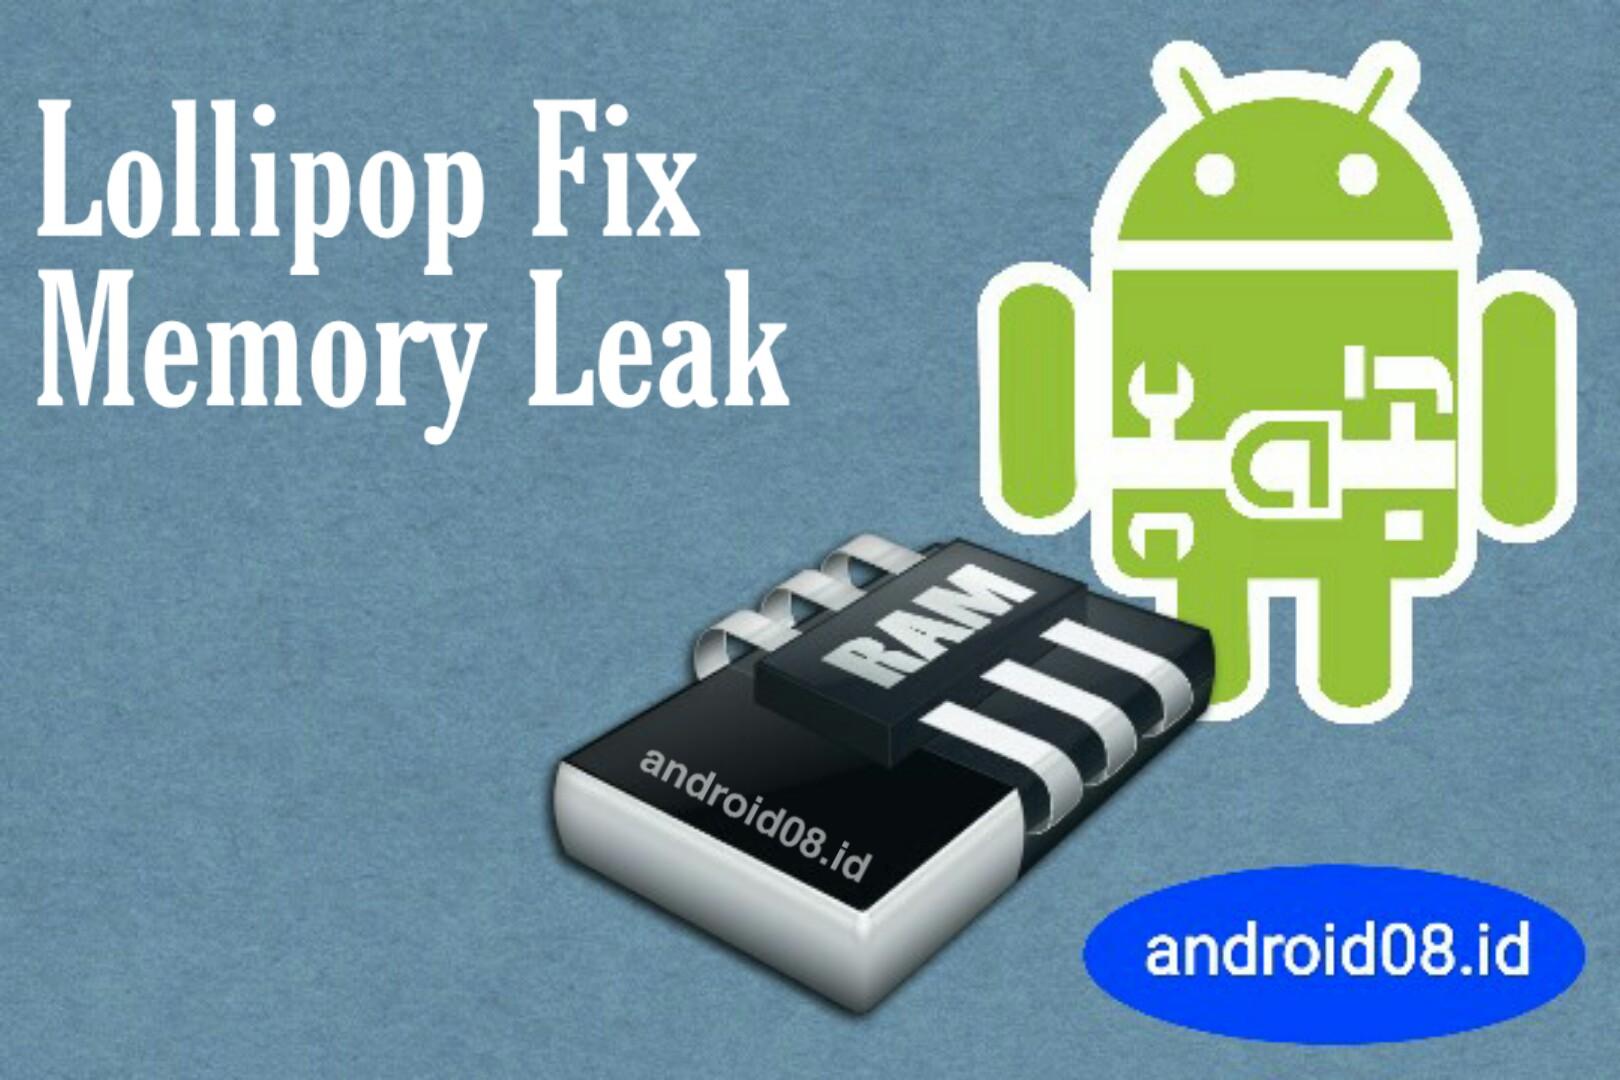 Android Lollipop Fix Memory Leak